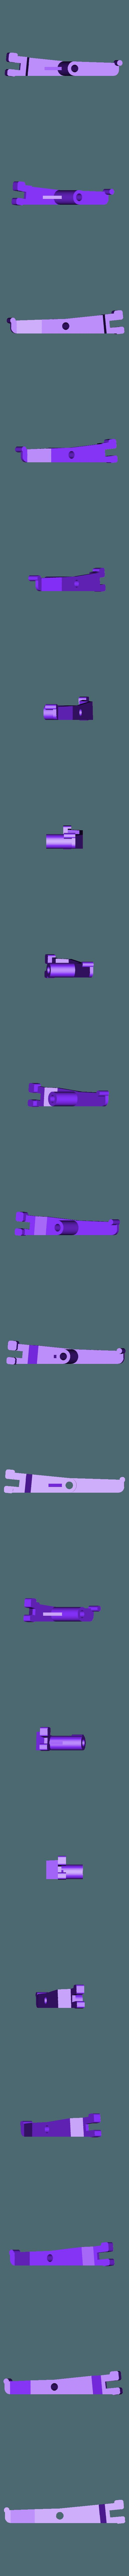 SWITCH ACTUATOR.STL Download free STL file Switch actuator 3B-7297 flipper williams • 3D print model, alex20117